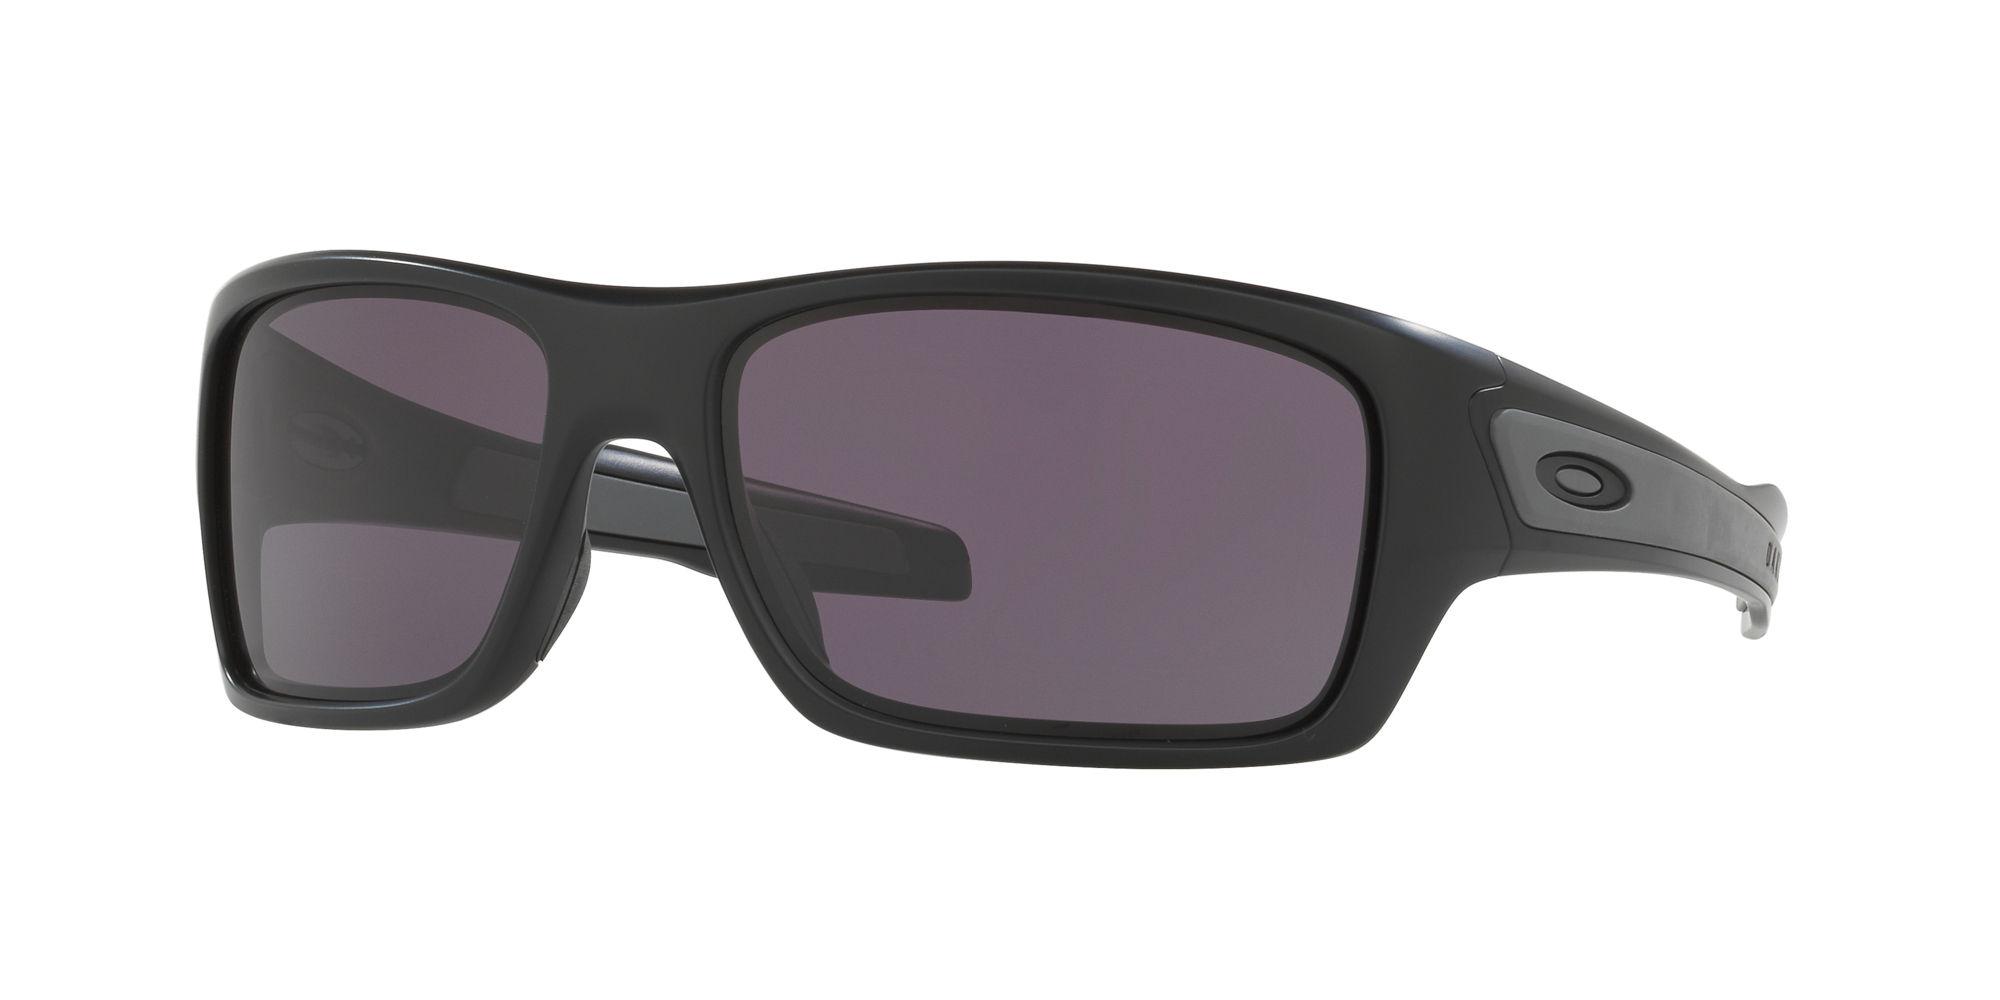 Oakley Grey Wrap Around Sunglasses - OO9263_01_65-17